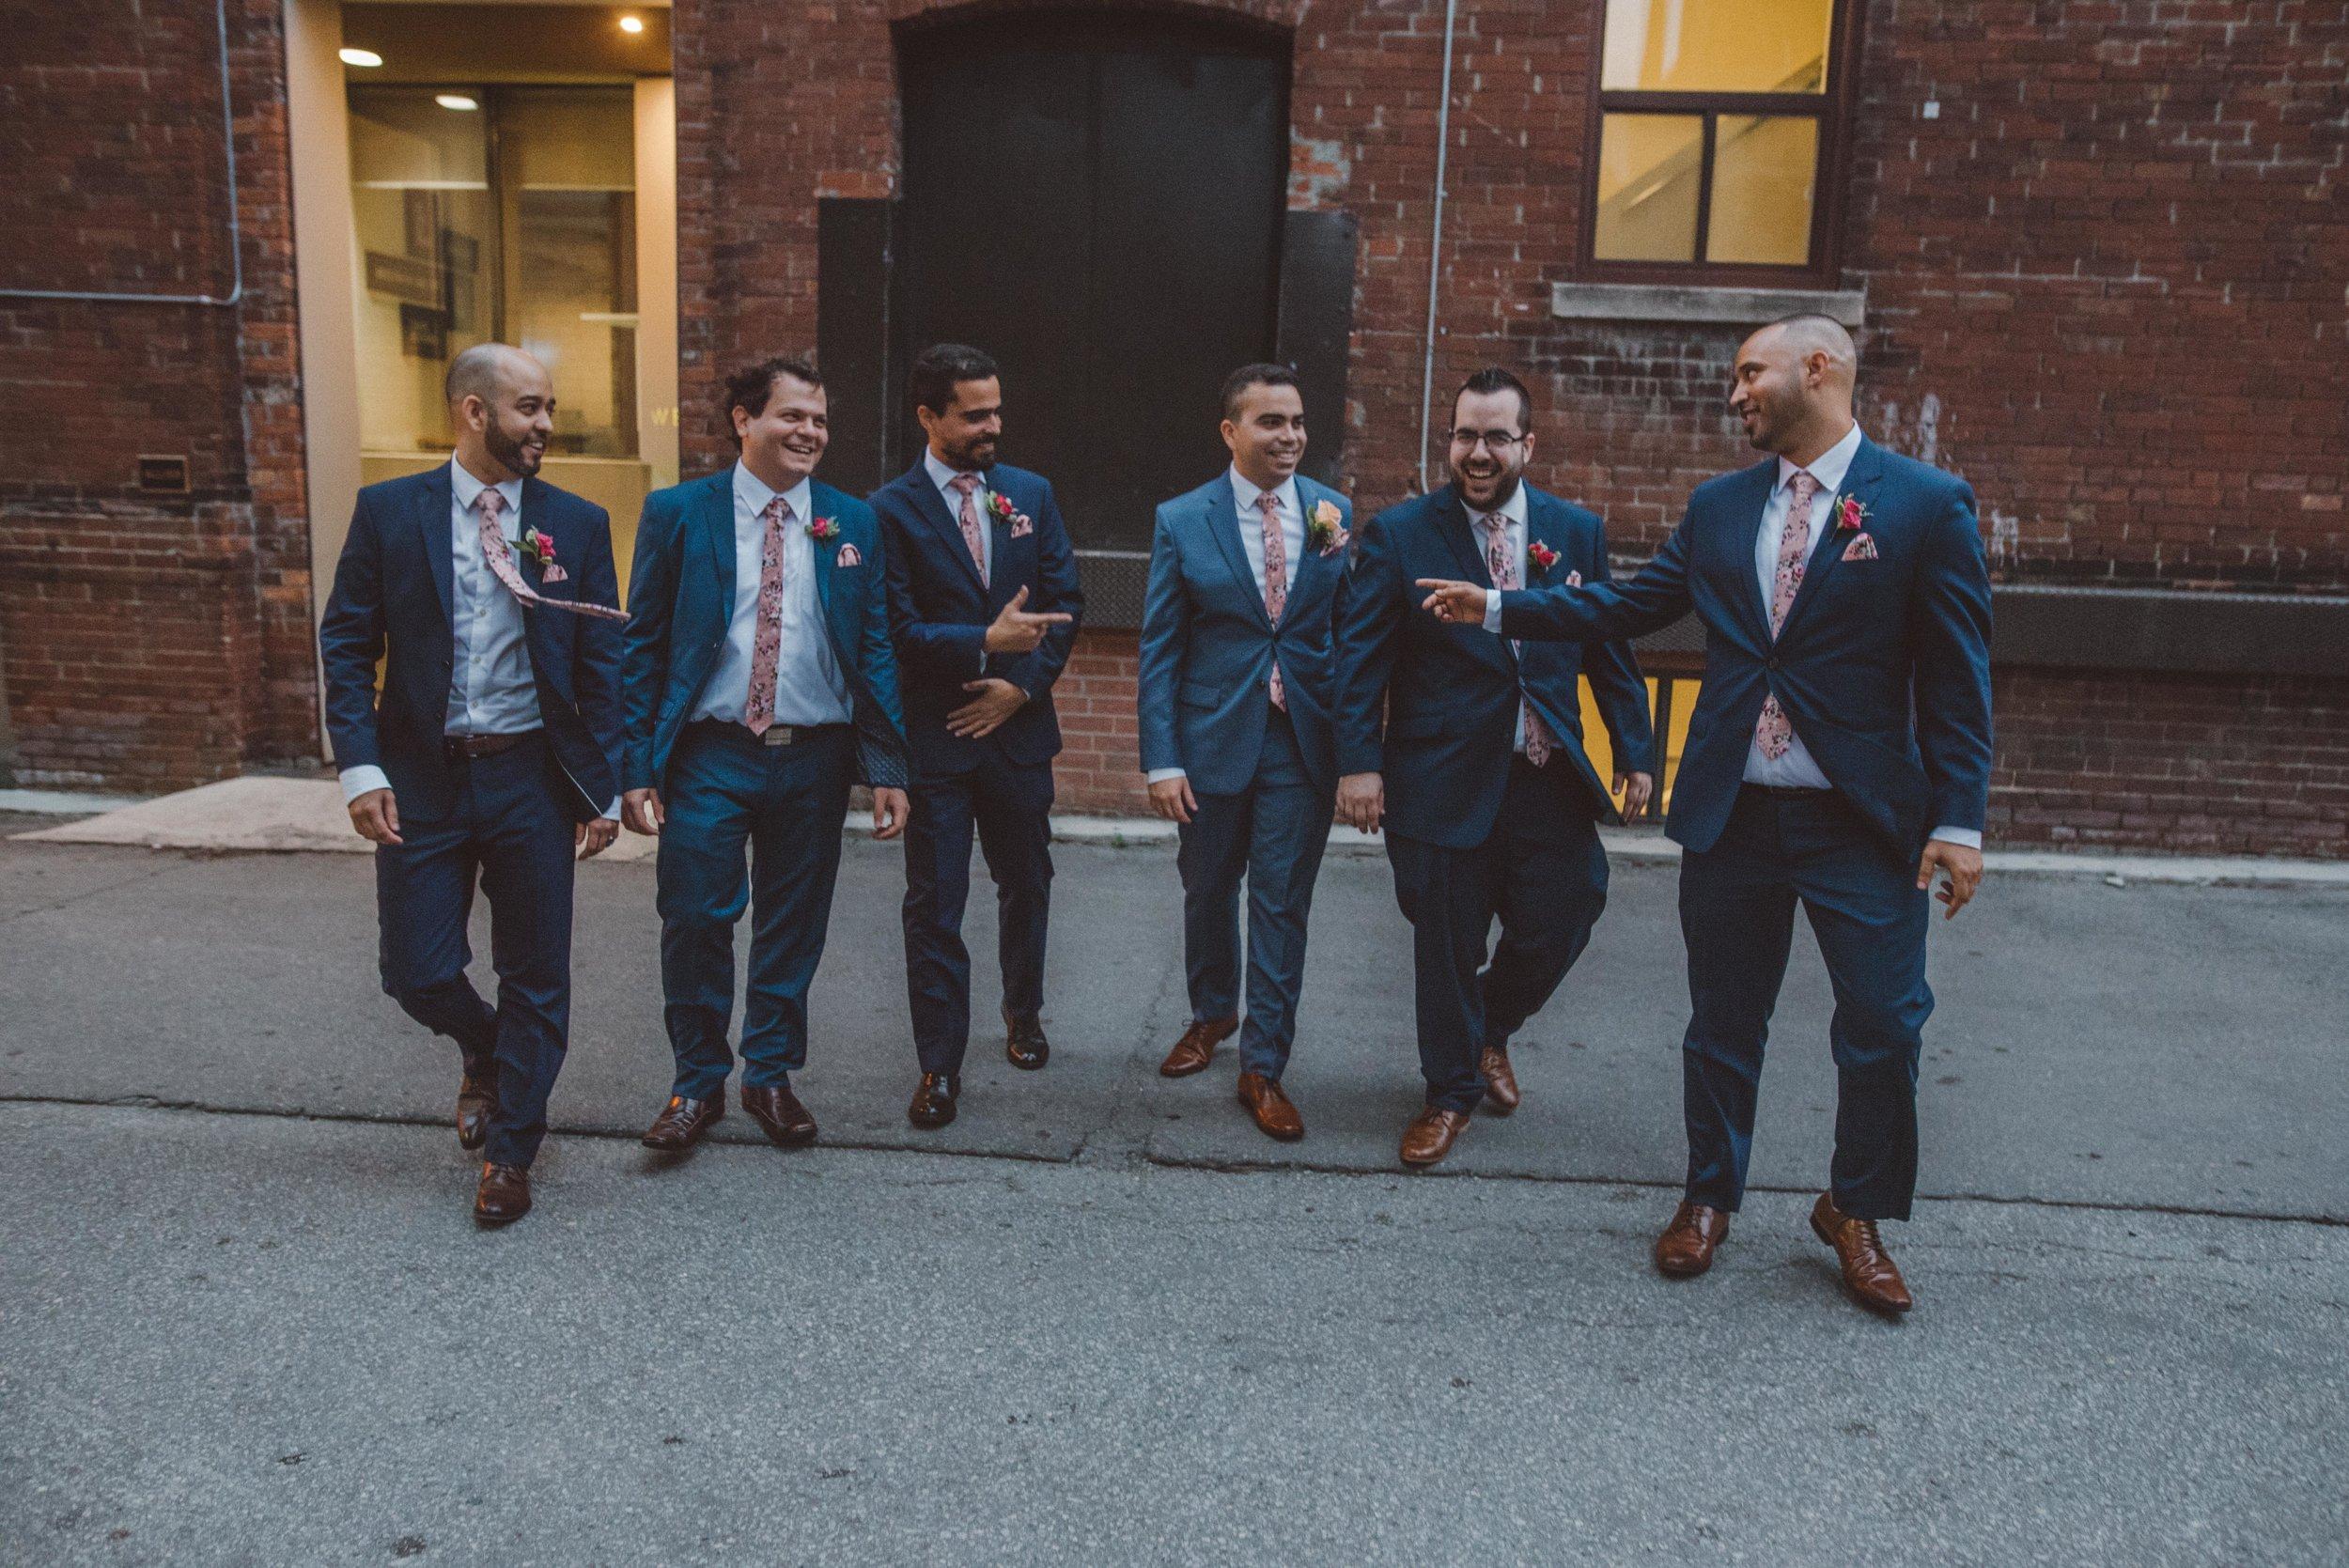 mariage_photographe_toronto_gatineau_ottawa_photographer_wedding-10.jpg